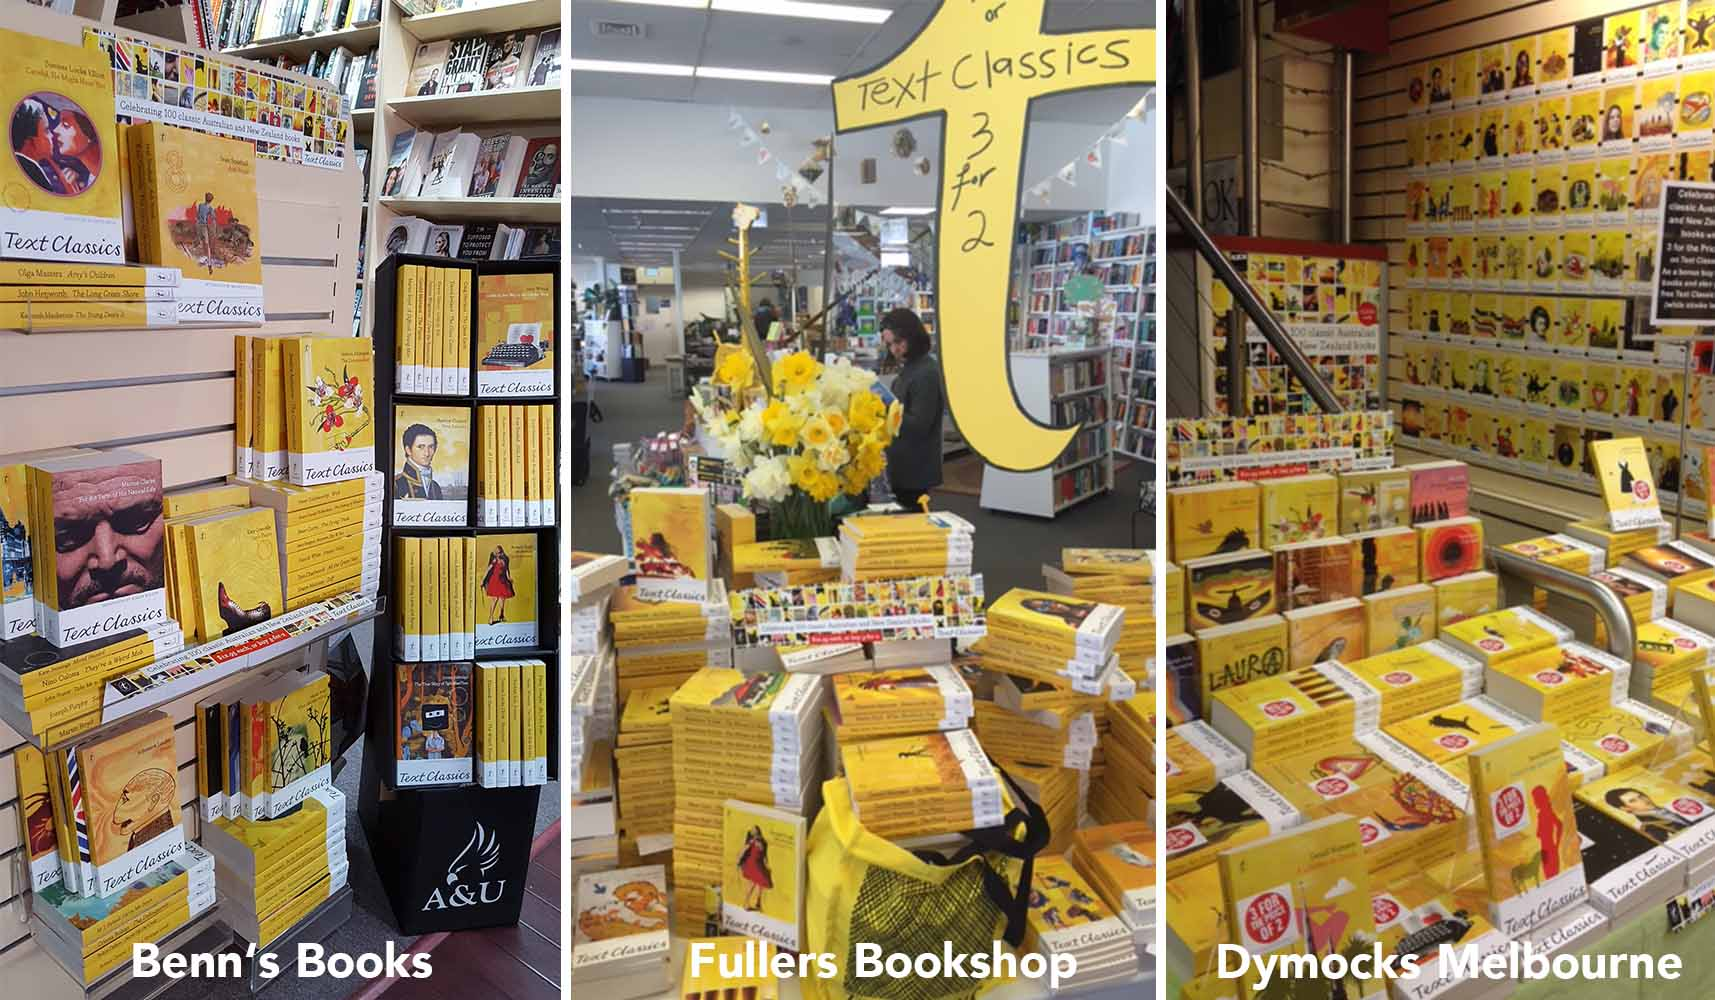 Bookshop displays of the Text Classics